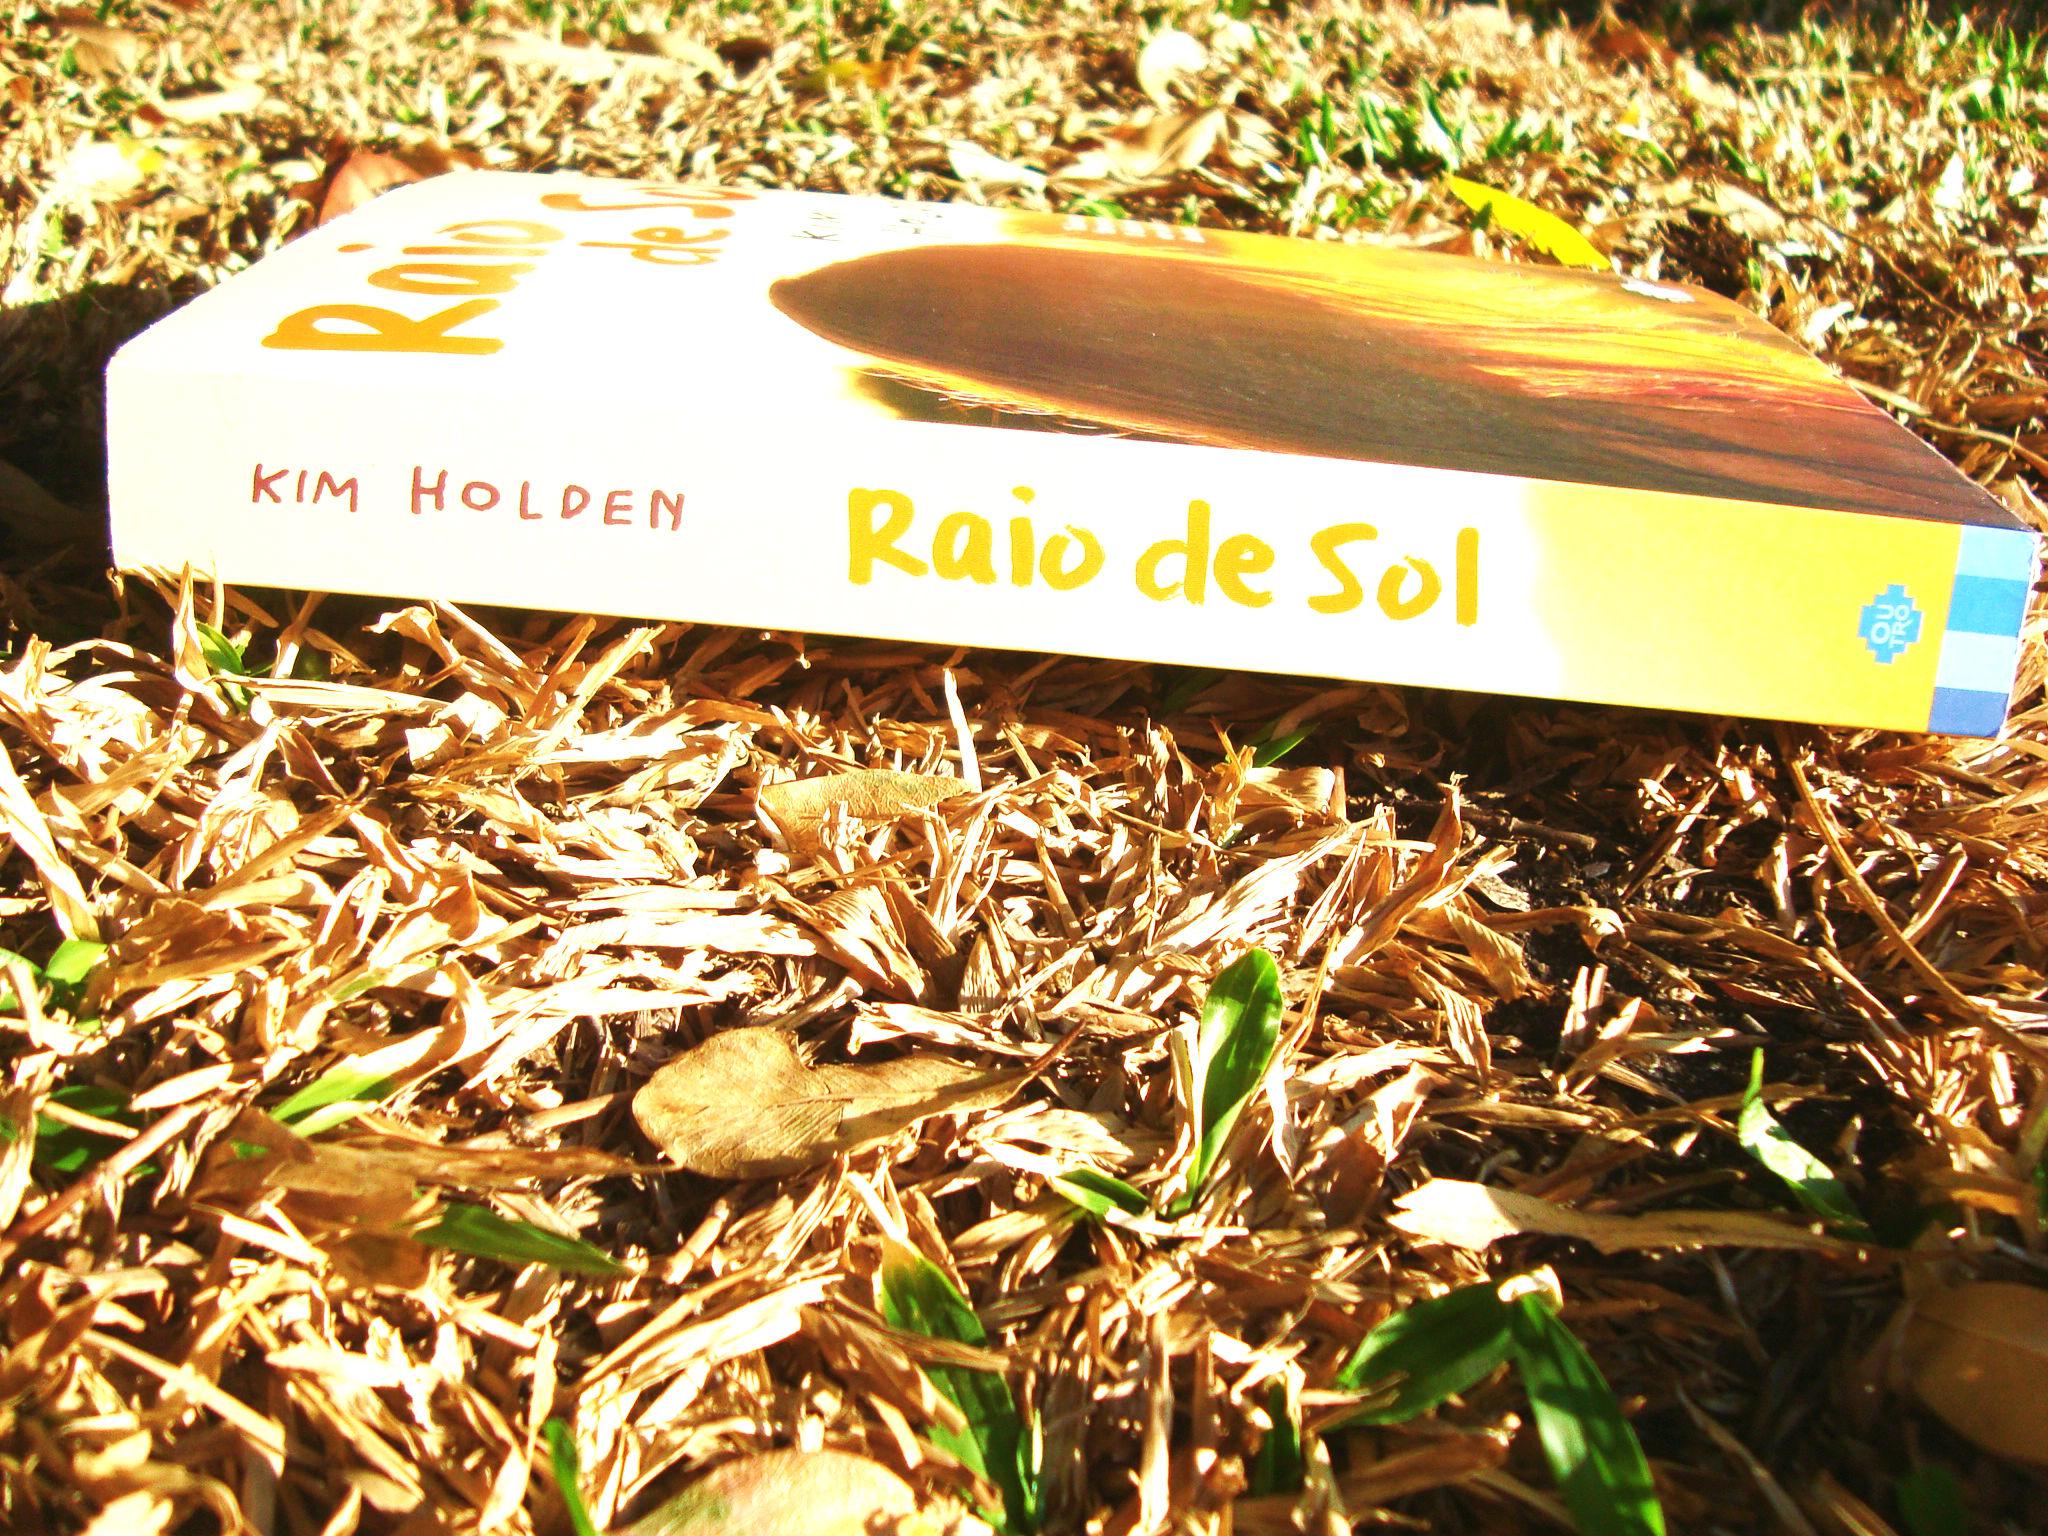 raio de sol - resenha do livro